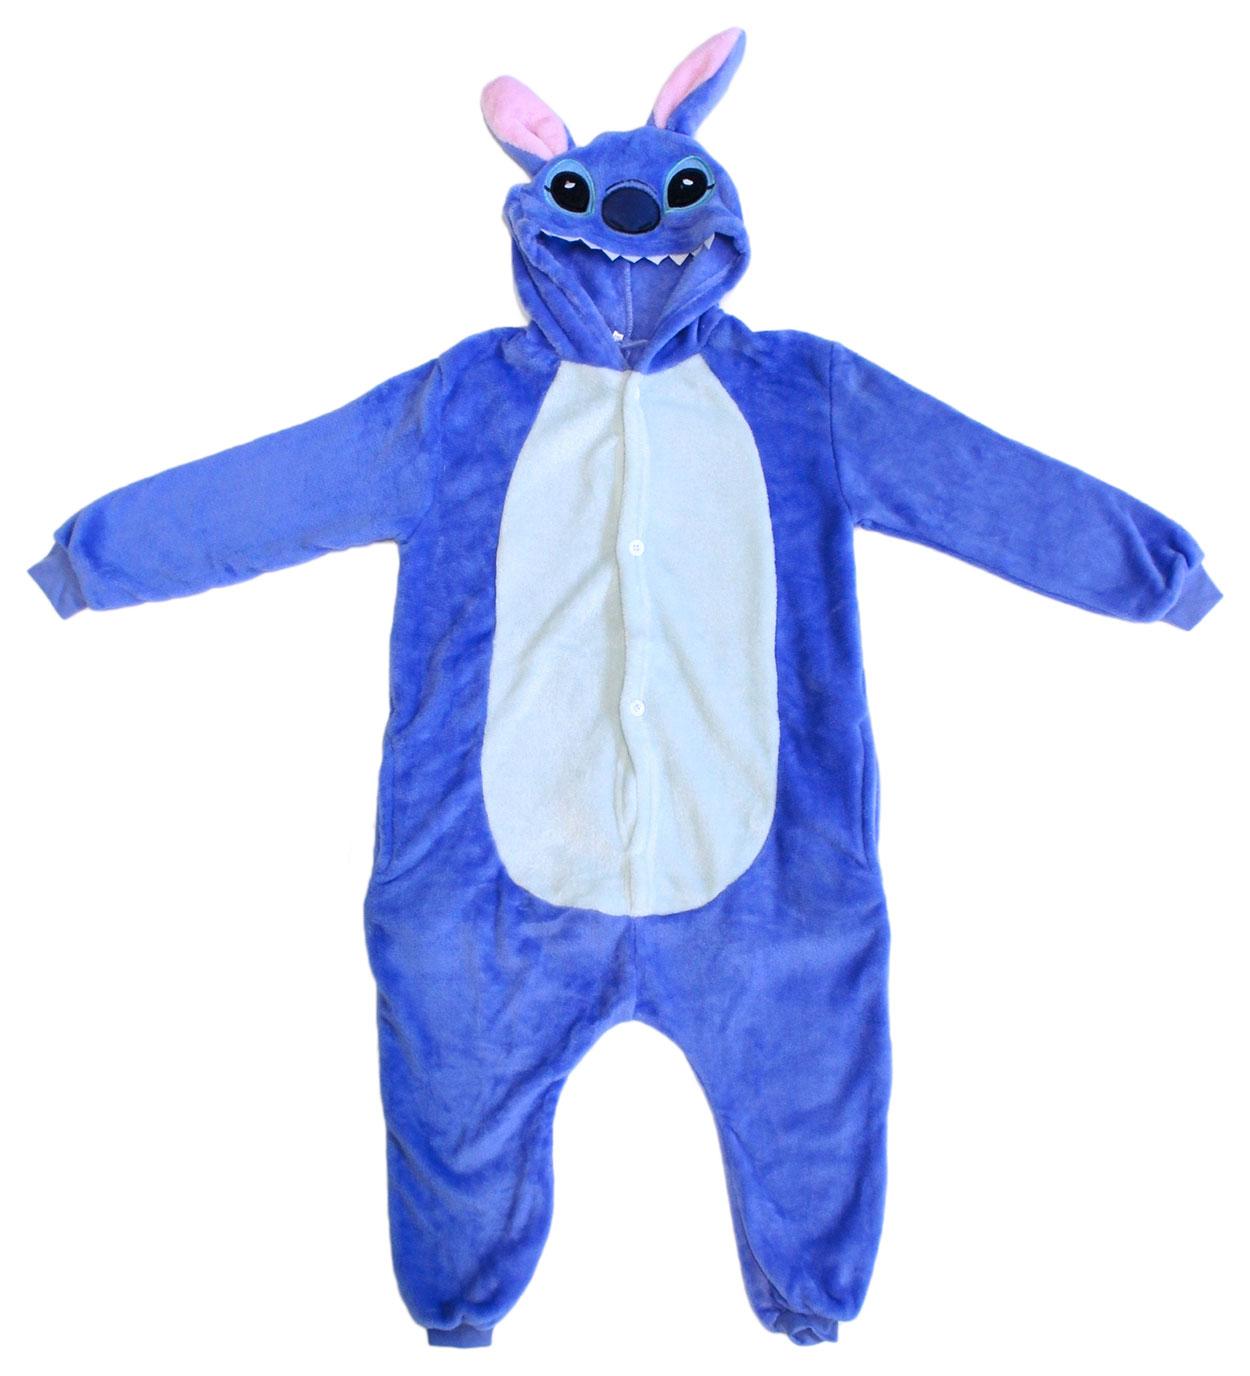 Пижама-кигуруми Lilkrok Синий Стич 170-179 см фото